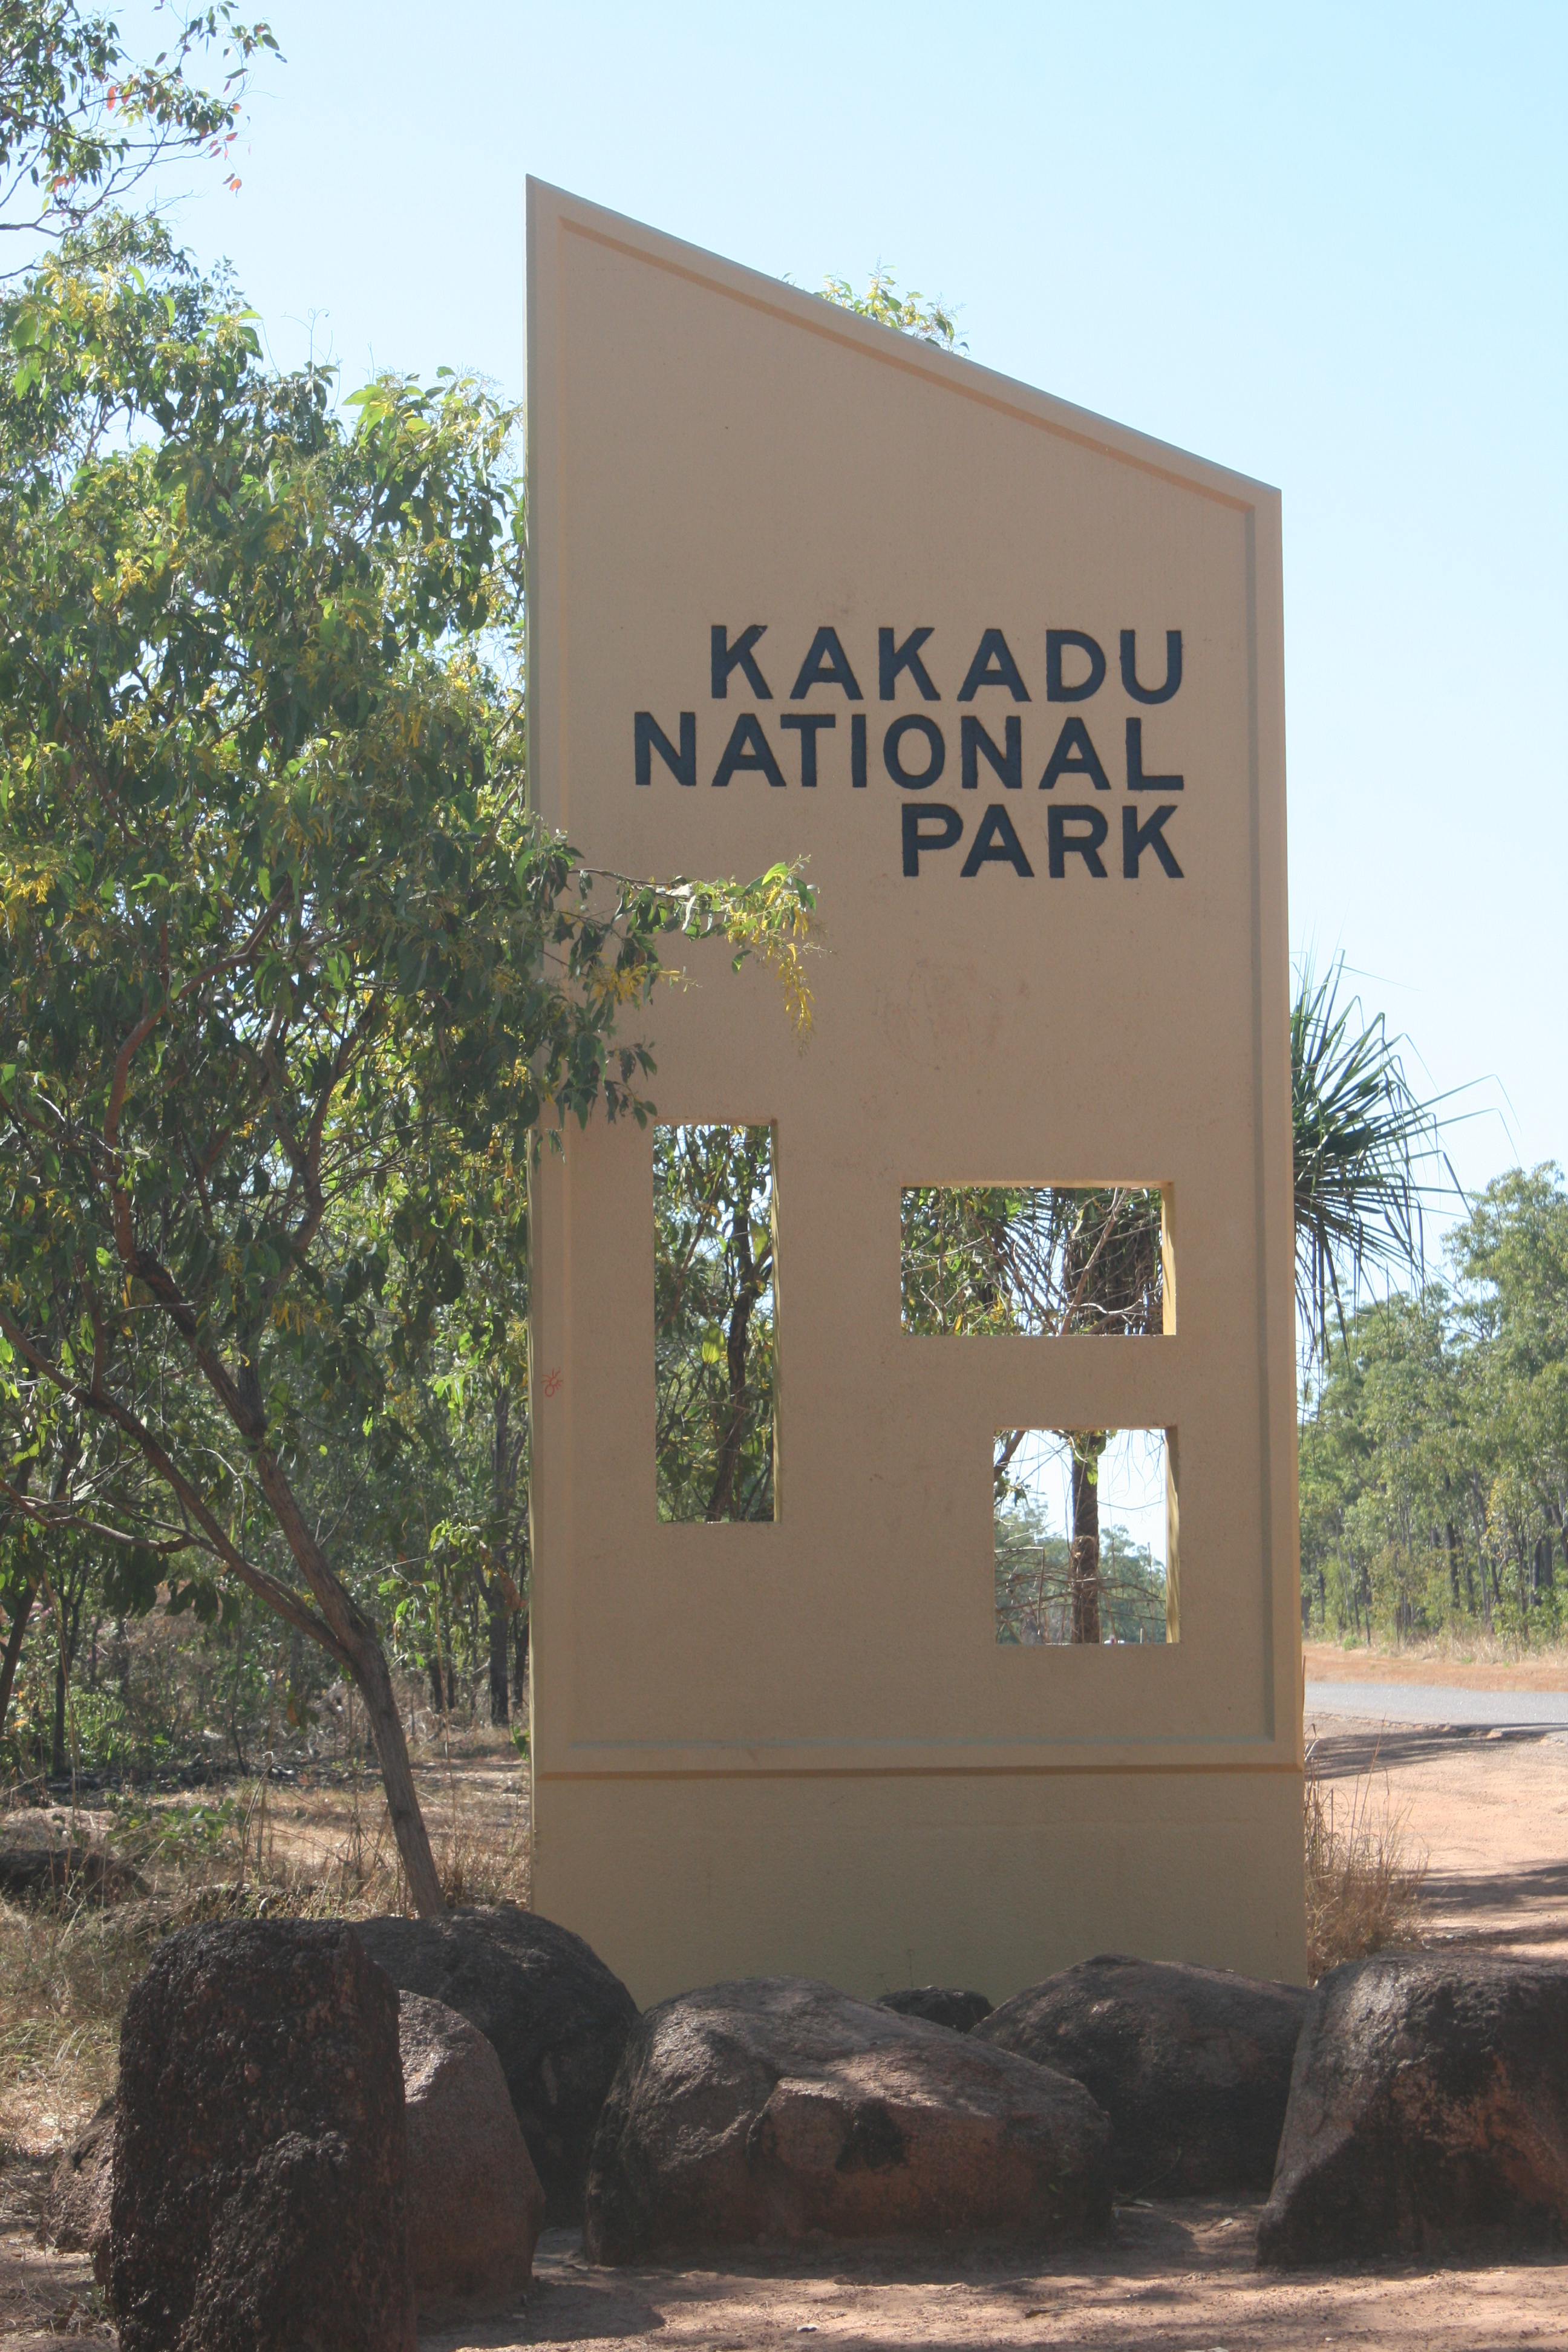 Kakadu National Park Jun Jul CJ Adventuring - 11 things to see and do in kakadu national park